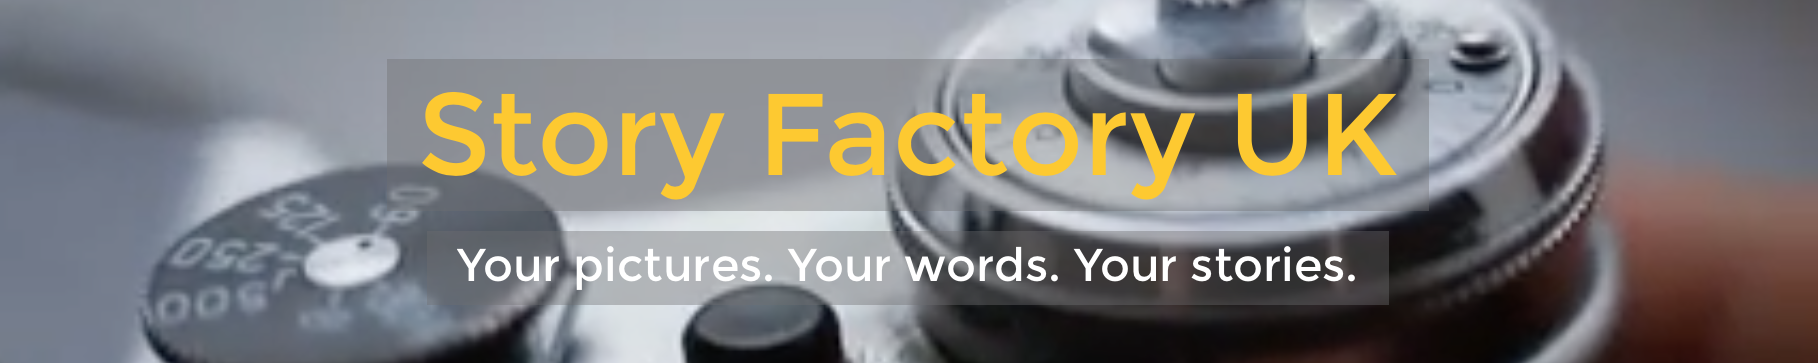 Story Factory UK